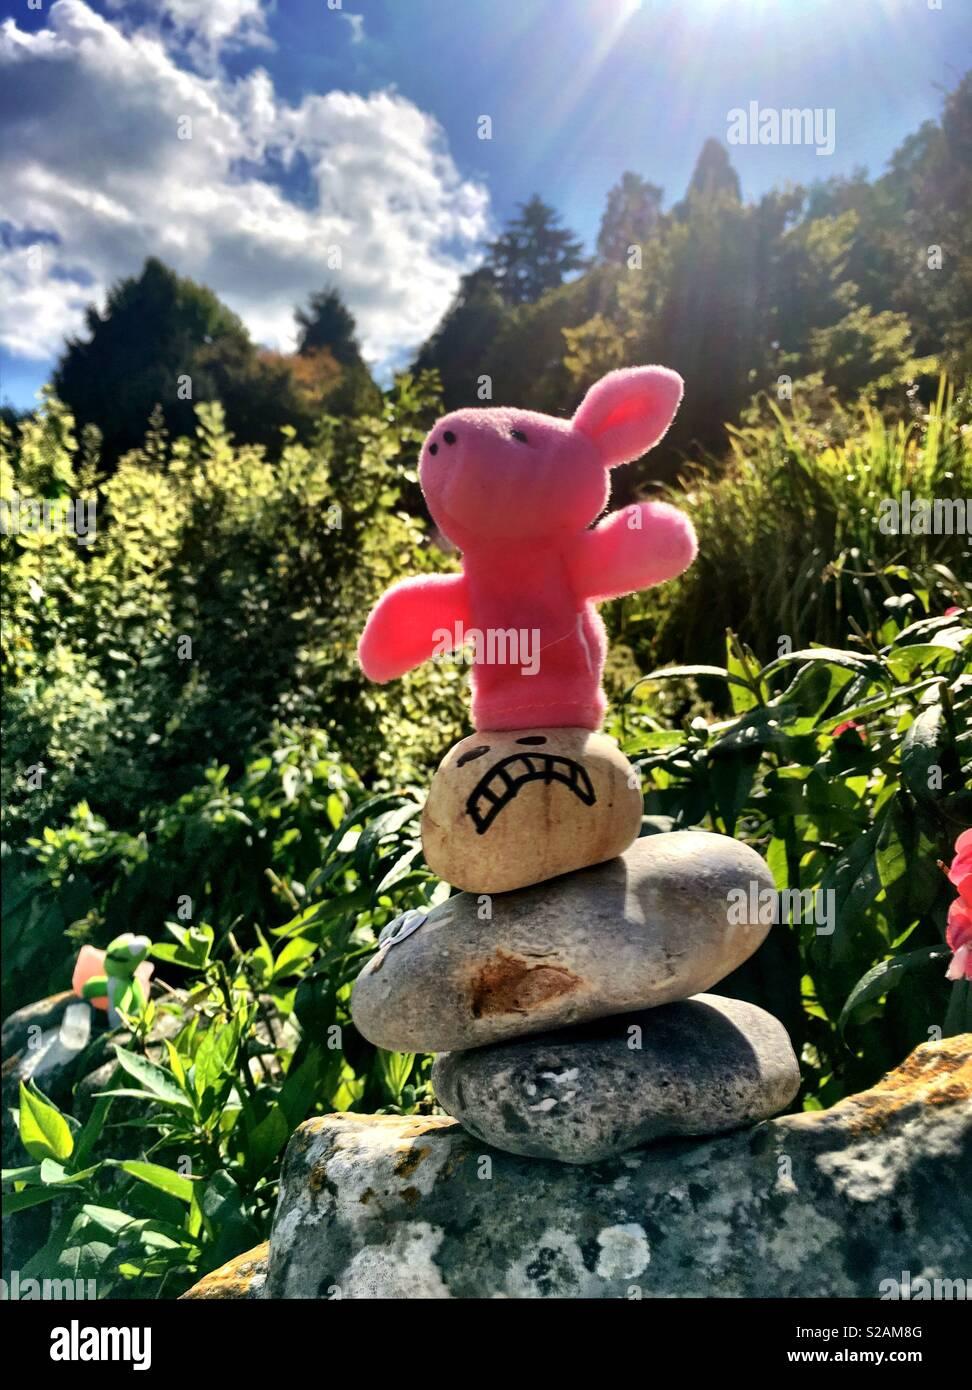 Pig fingerpuppet balancing on stones - Stock Image